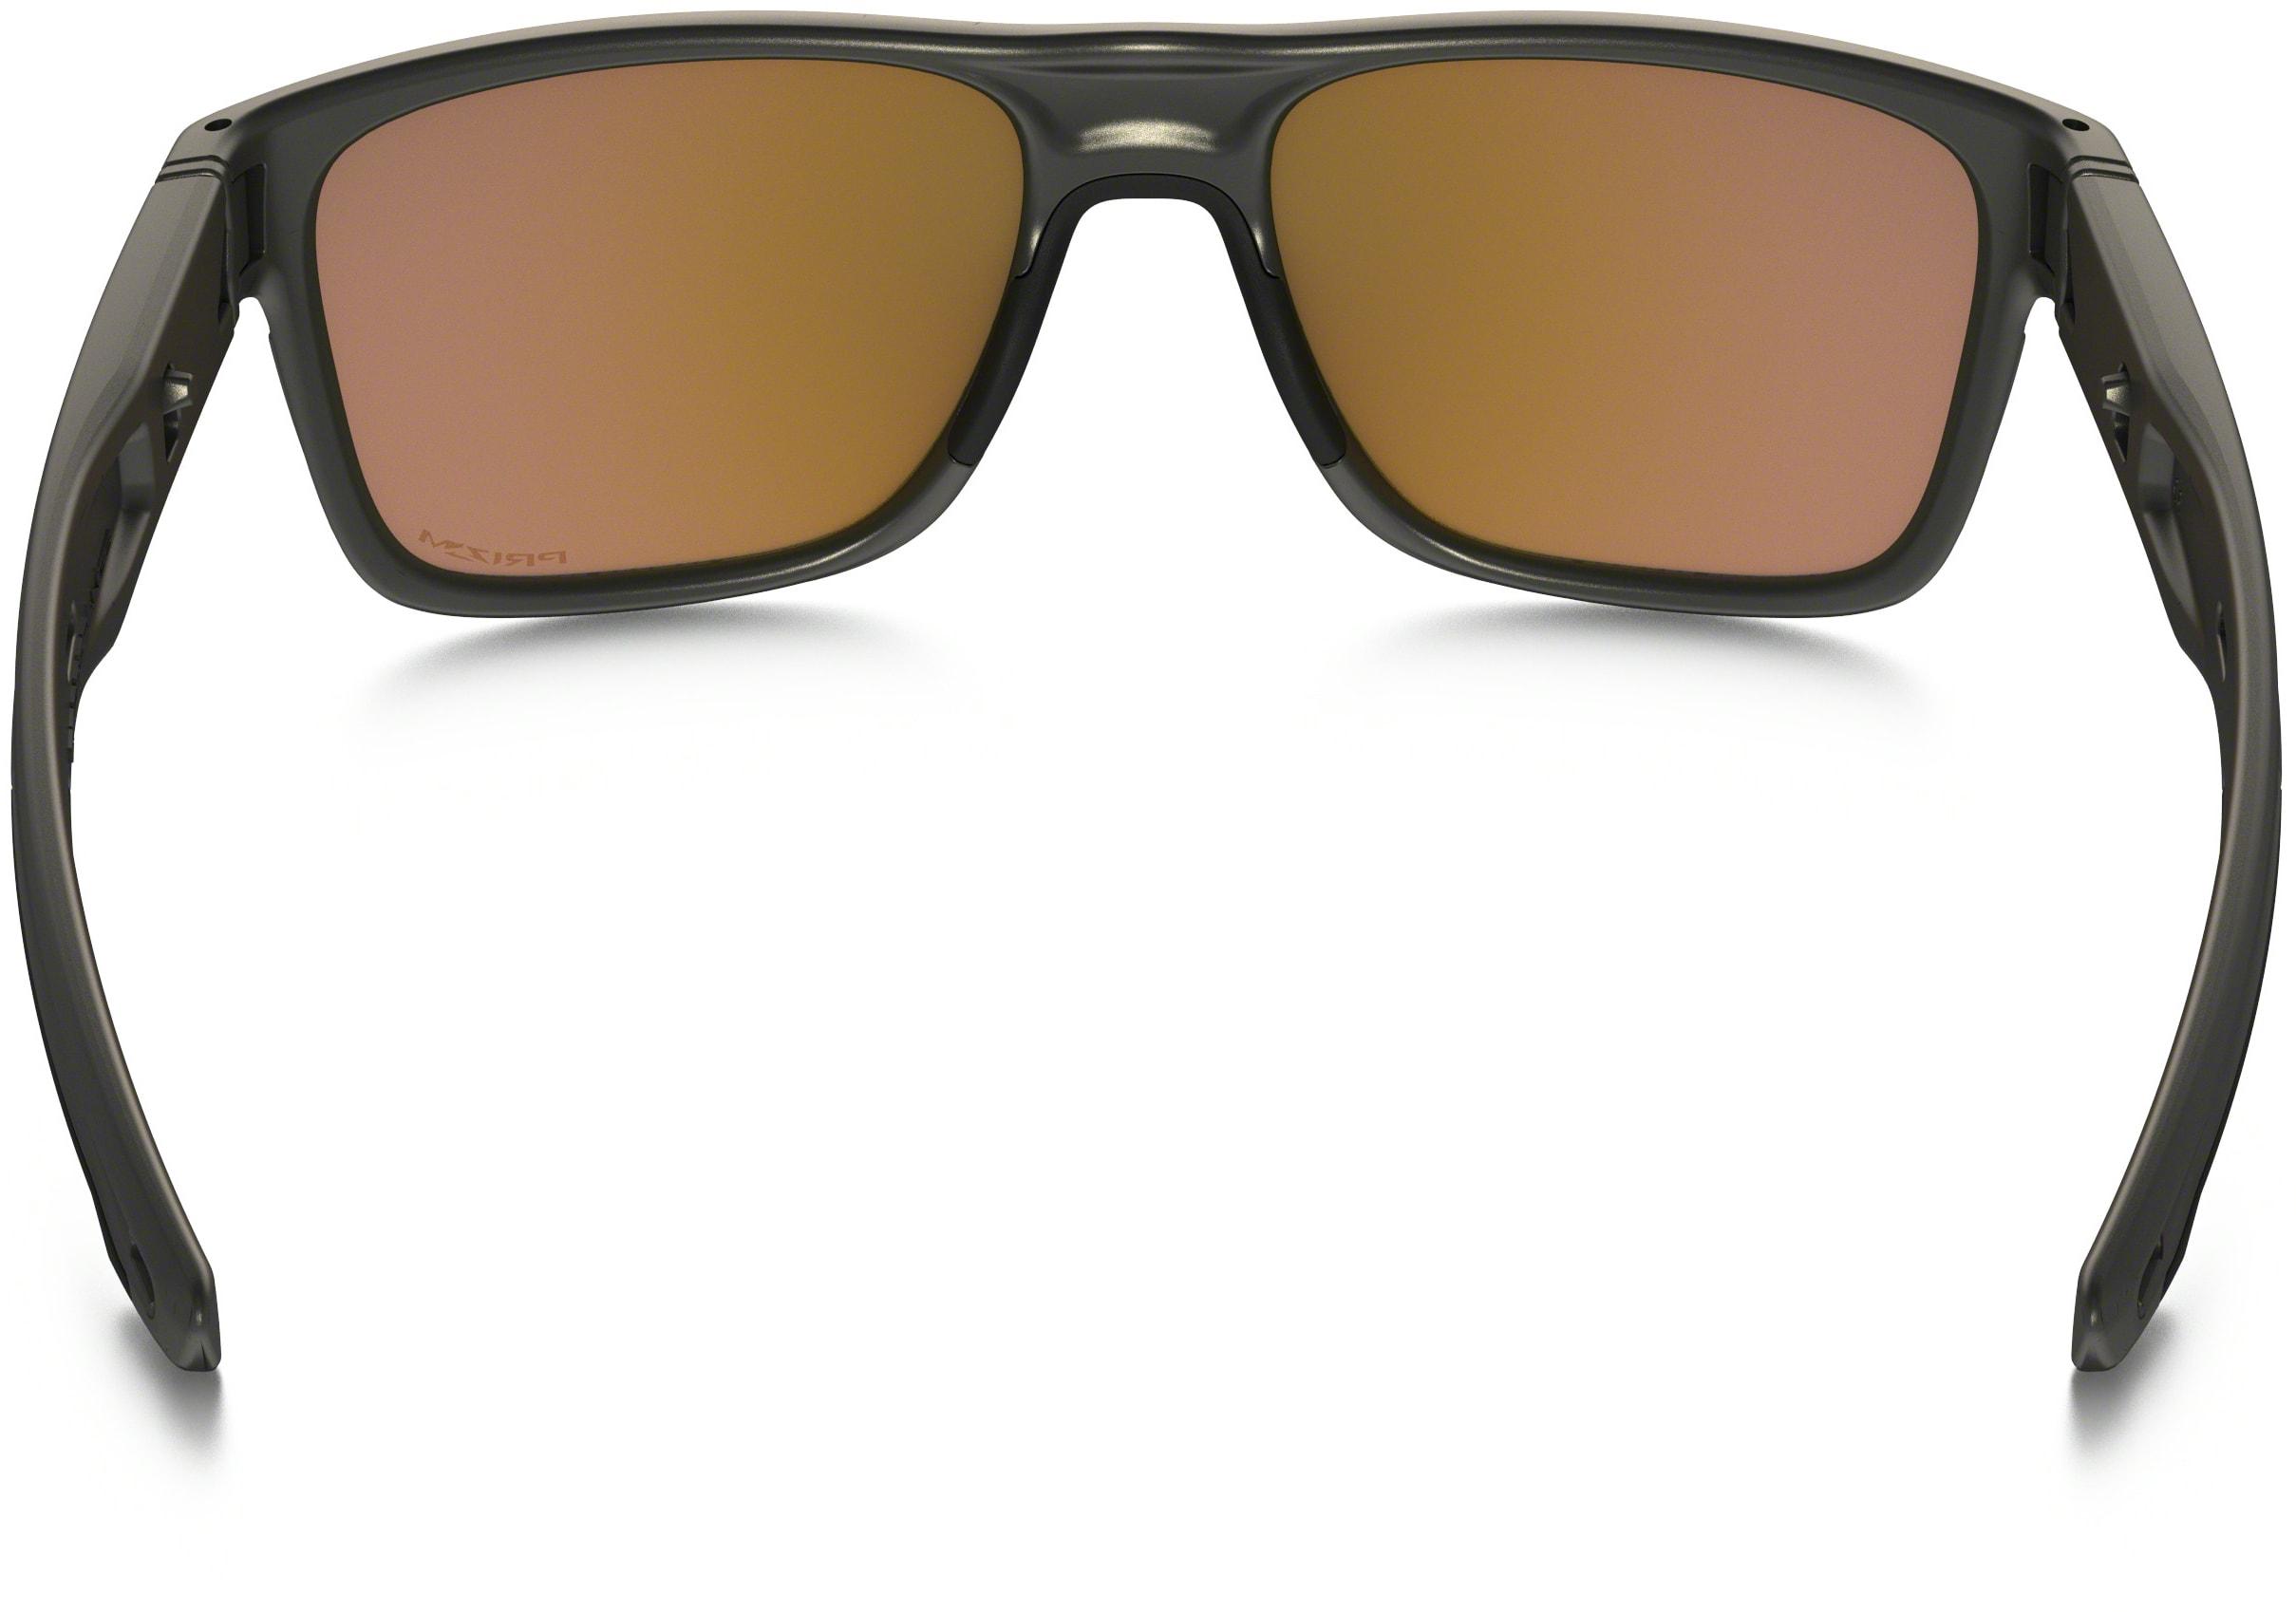 d96dcafae6 Oakley Crossrange Sunglasses - thumbnail 3